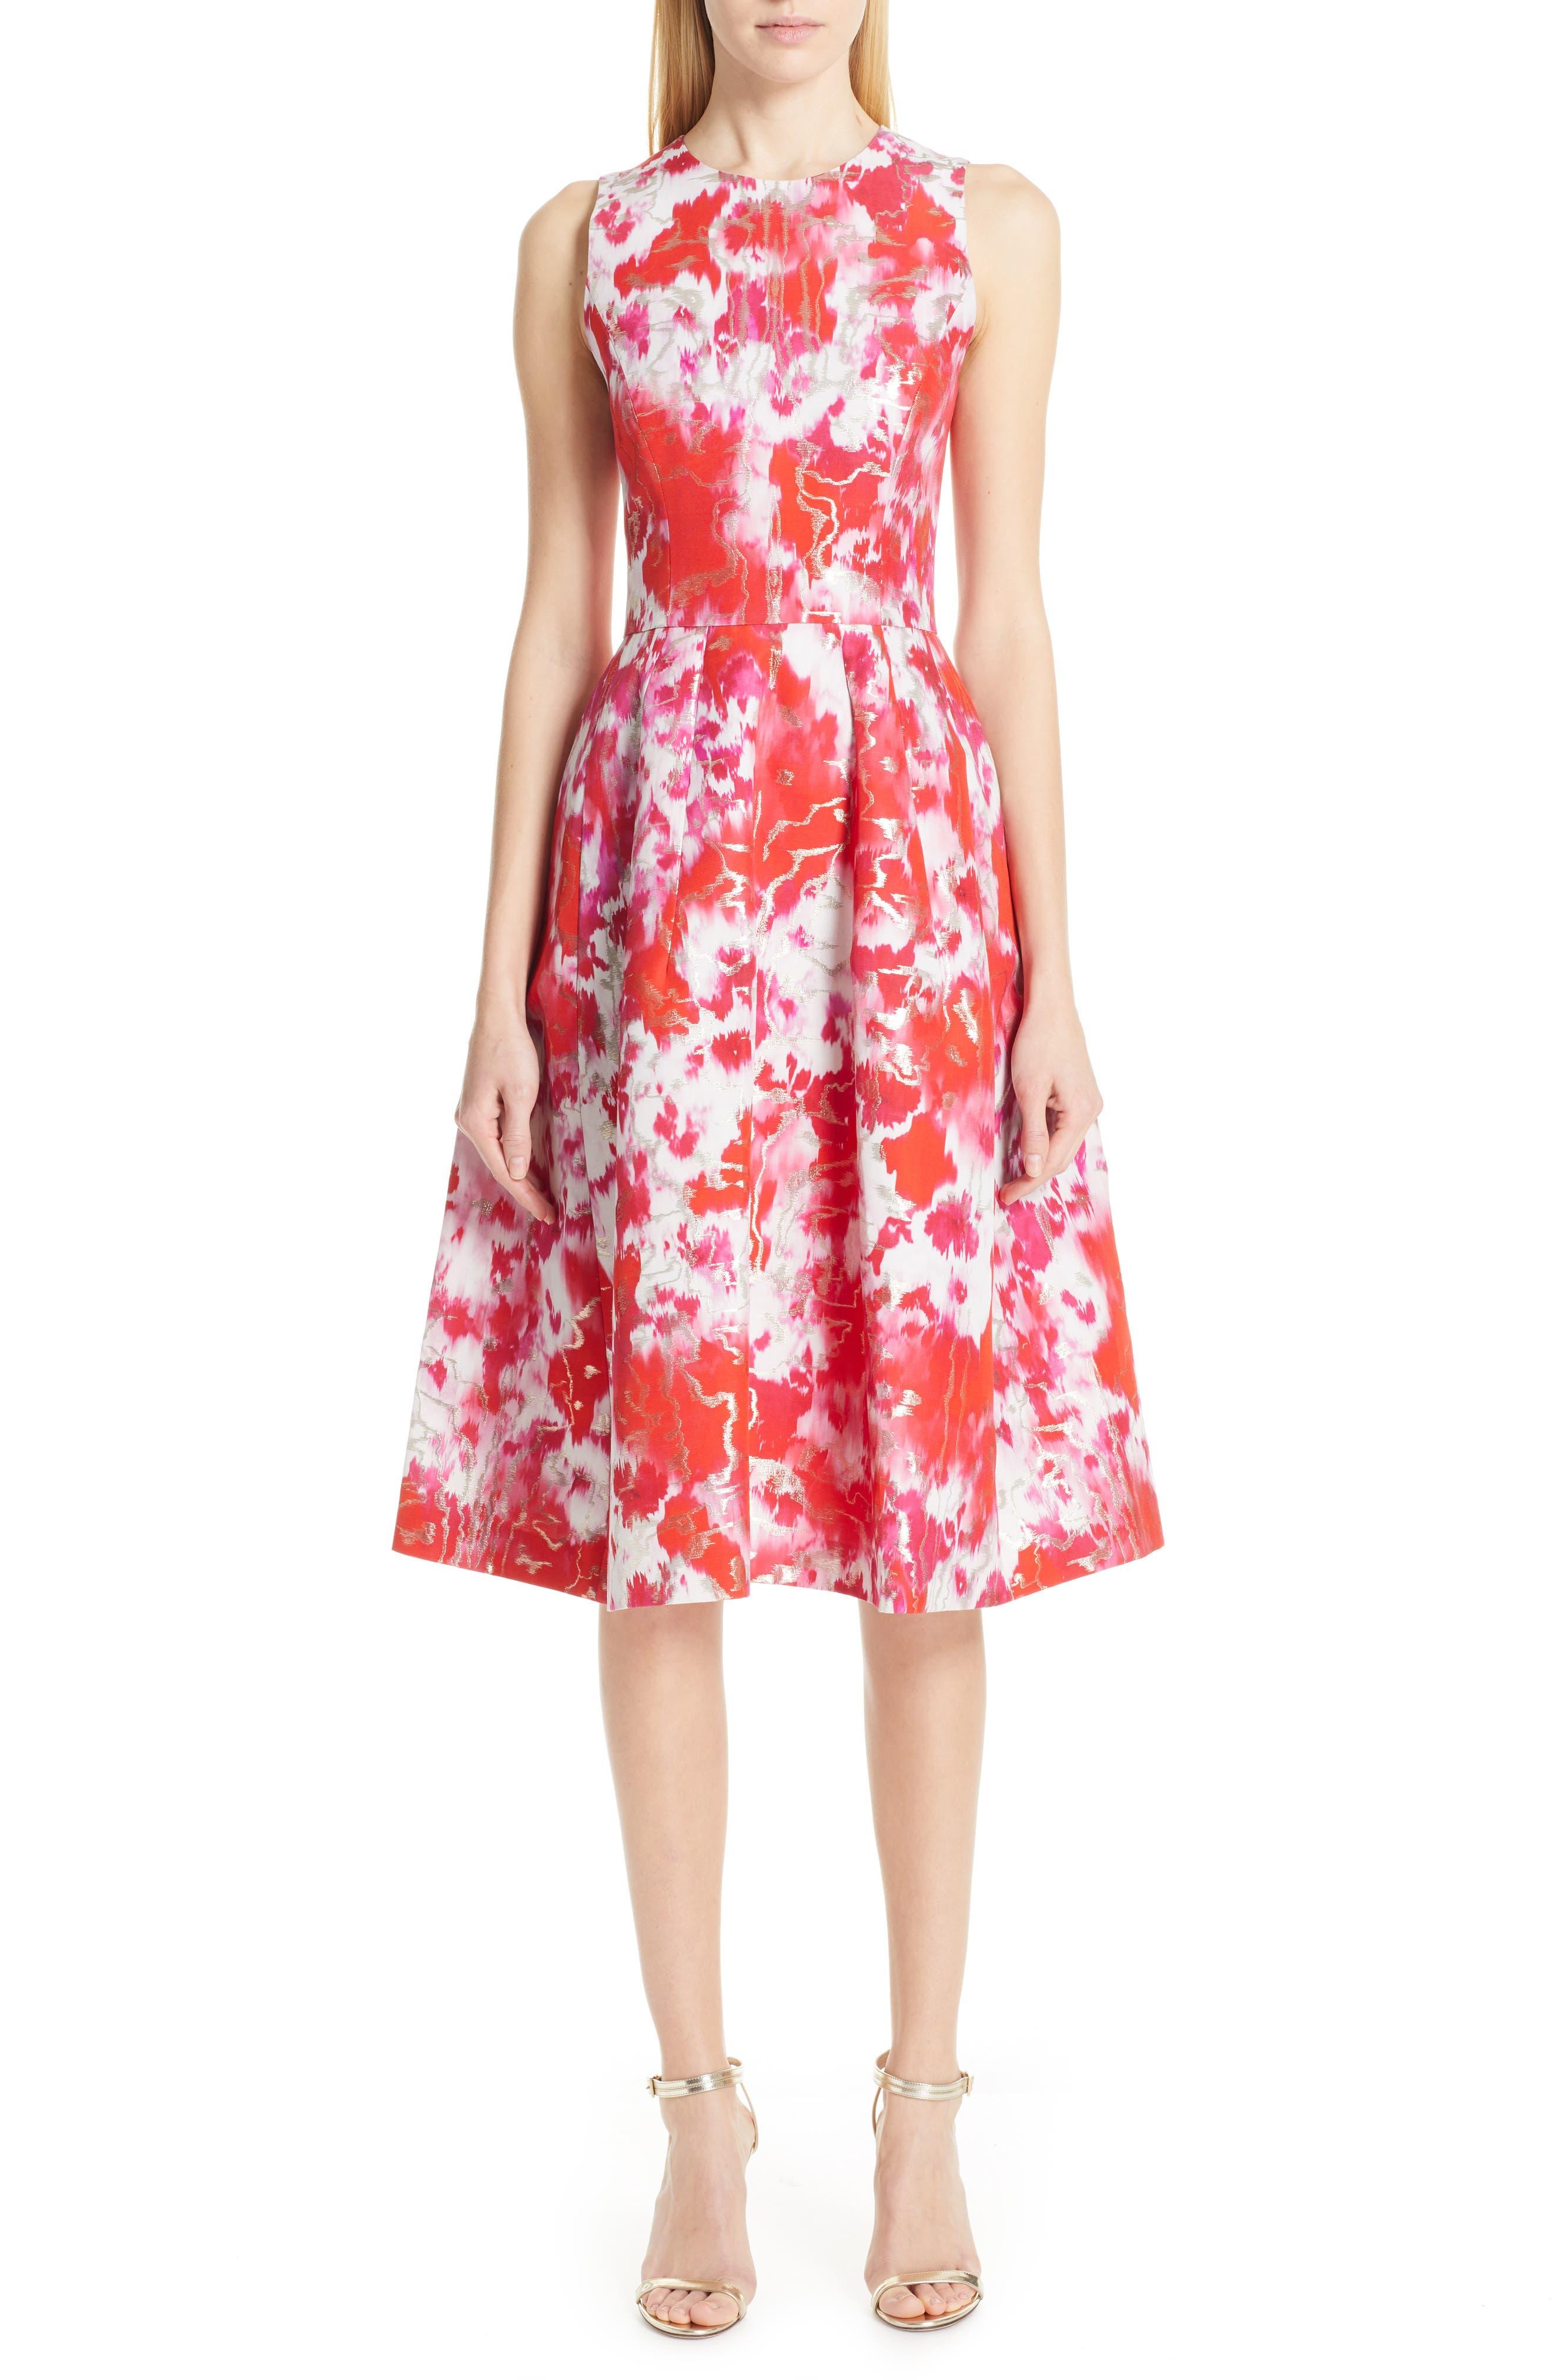 Carolina Herrera Floral Midi Cocktail Dress